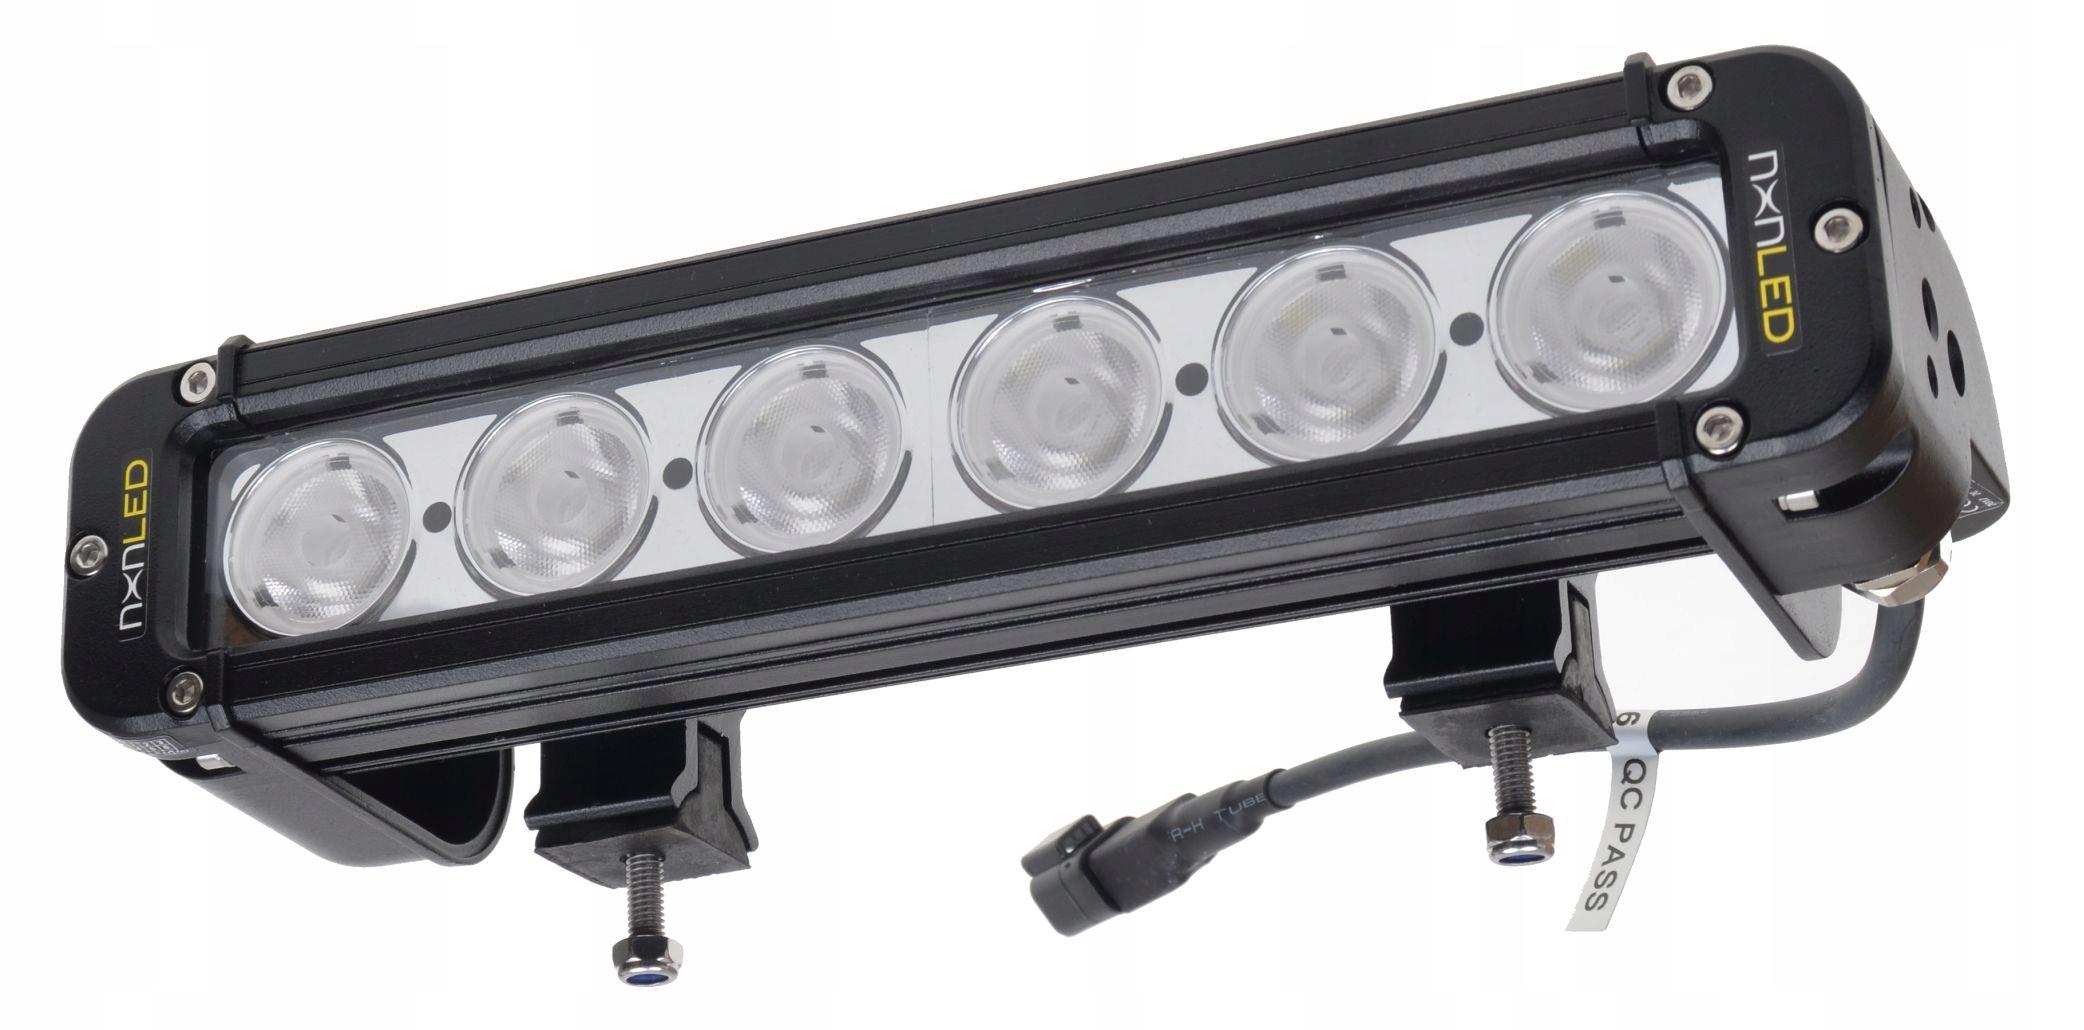 PANEL STRIP nXn 6x LED 60W CREE LAMP UTV ATV 4x4